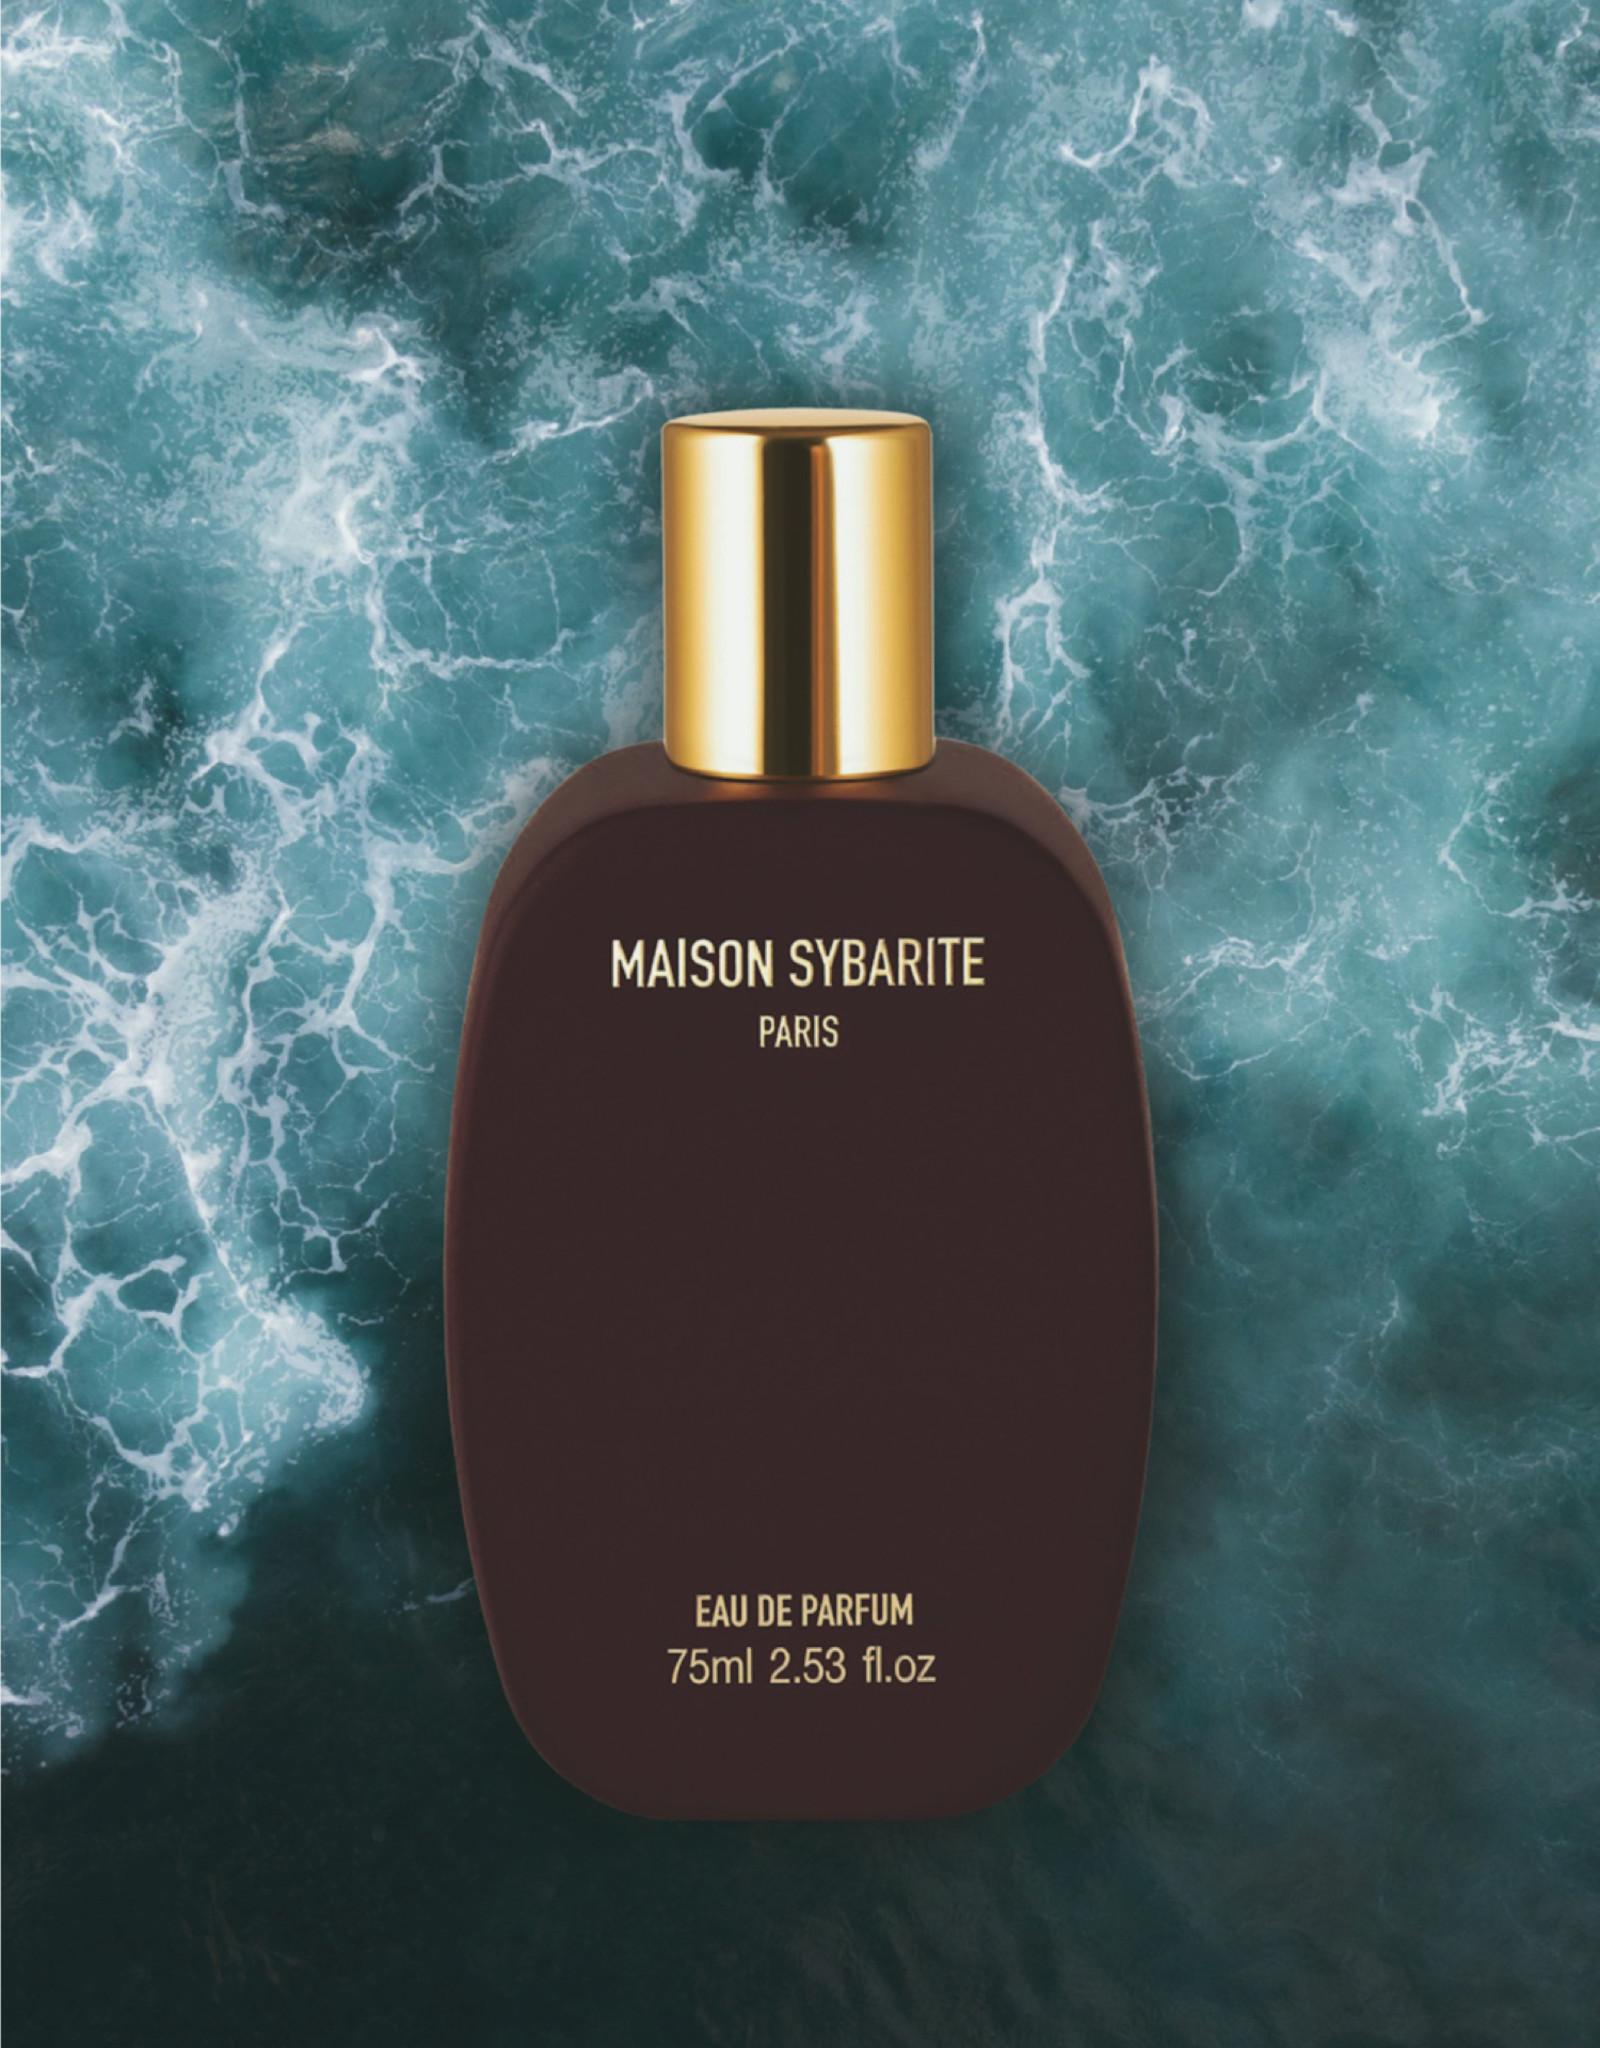 Maison Sybarite Maison Sybarite - Amber Gaze - Eau de Parfum